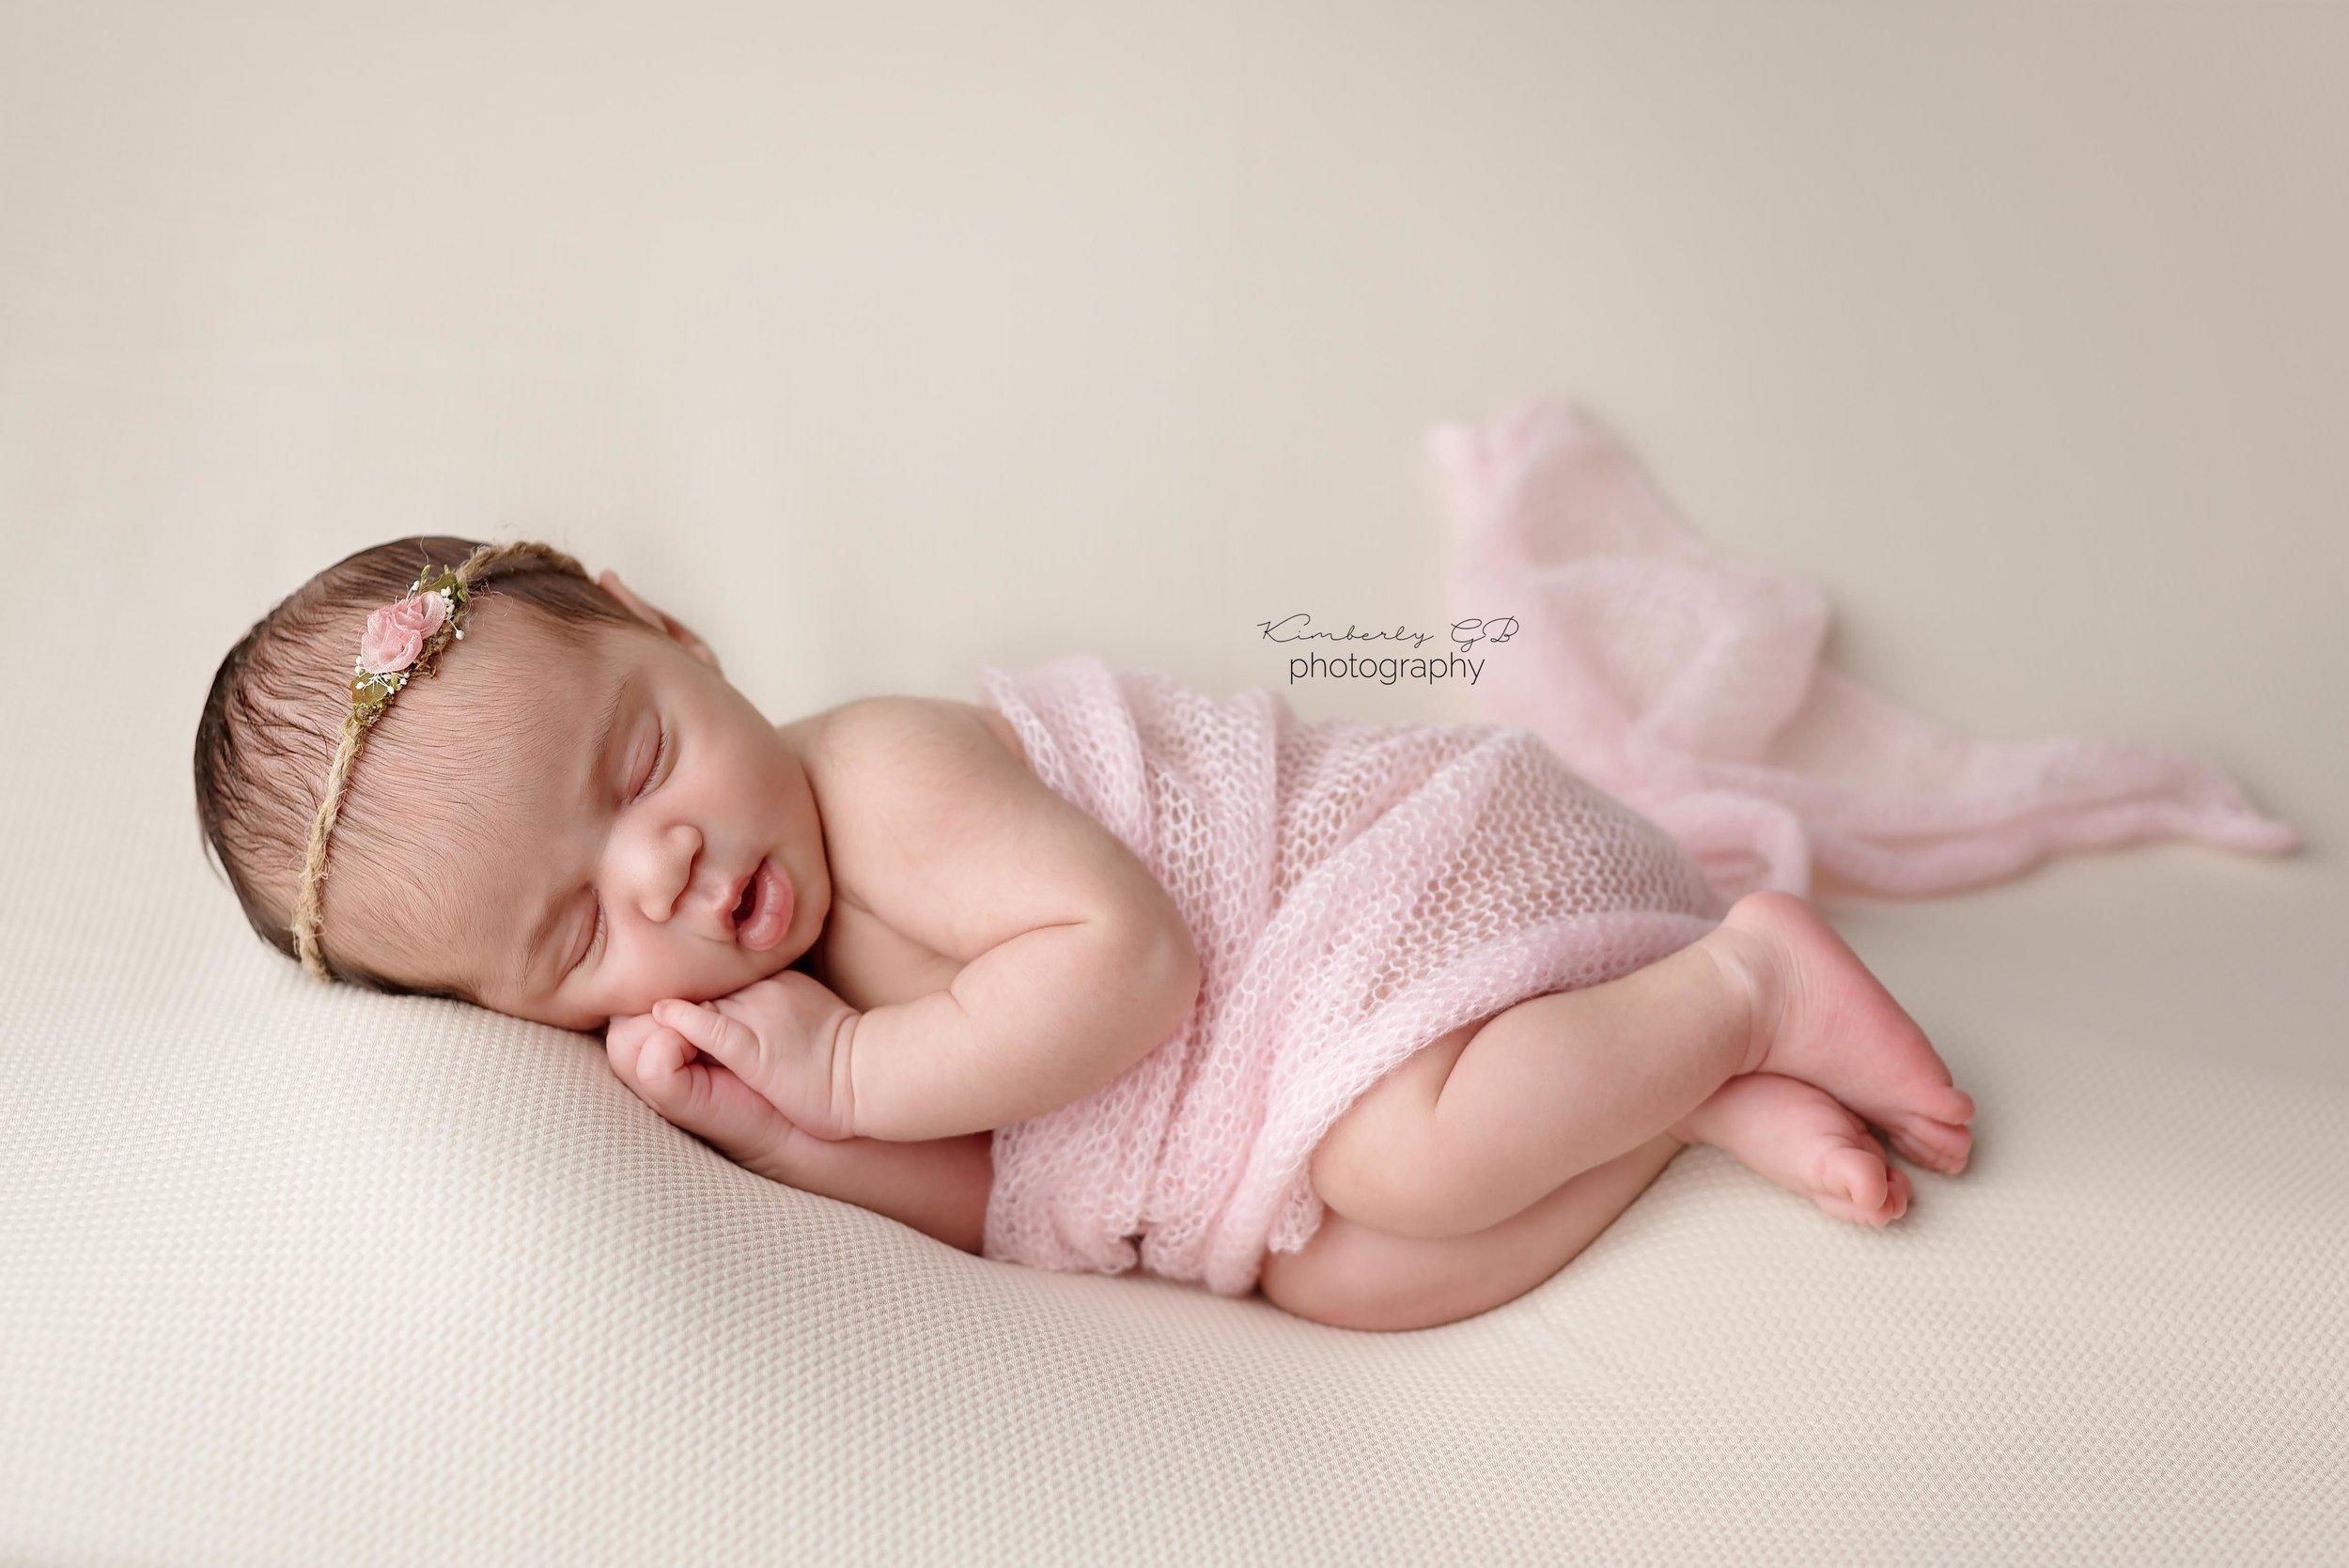 fotografia-de-recien-nacidos-bebes-newborn-en-puerto-rico-kimberly-gb-photography-fotografa-179.jpg